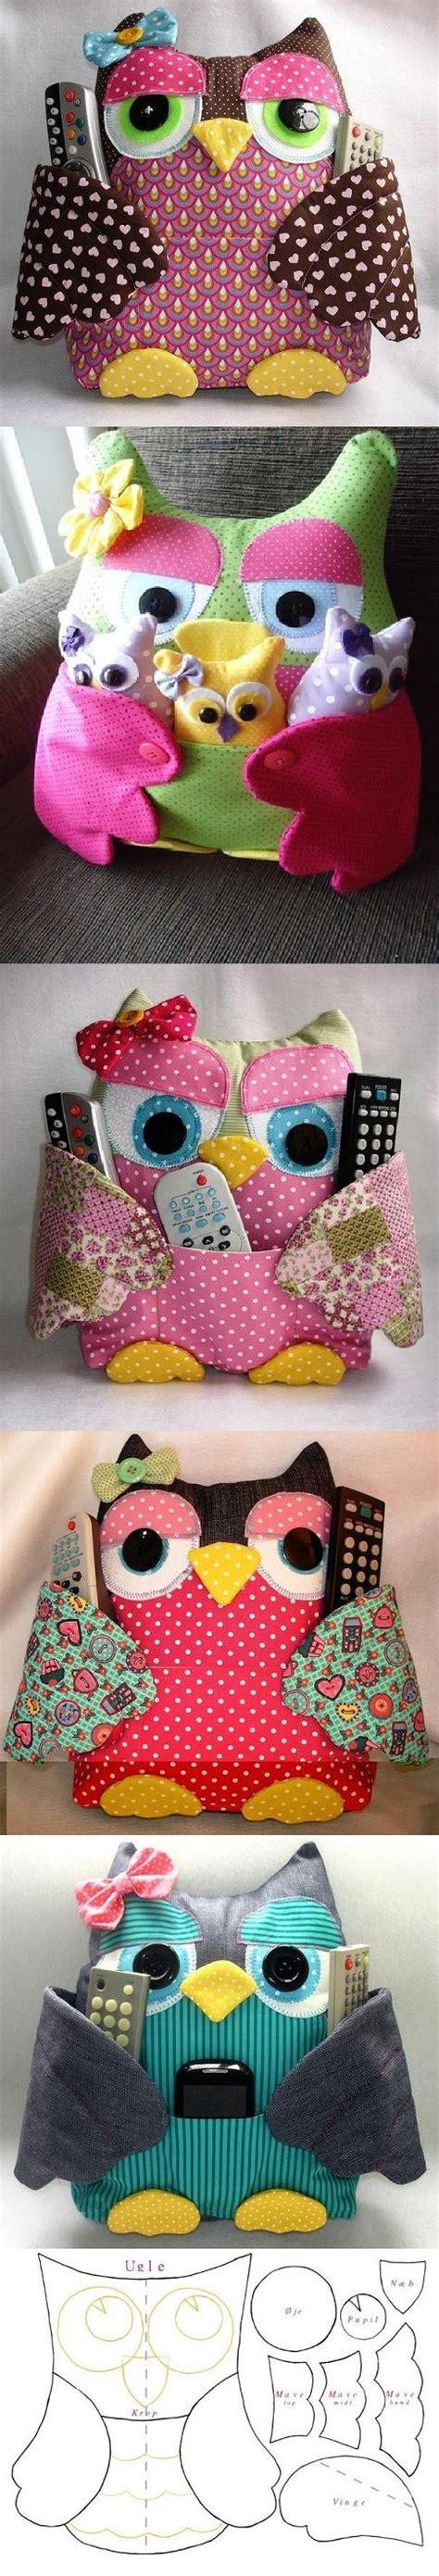 diy owl crafts diy owl pad with pockets handmade dolls posts diy and crafts and owl